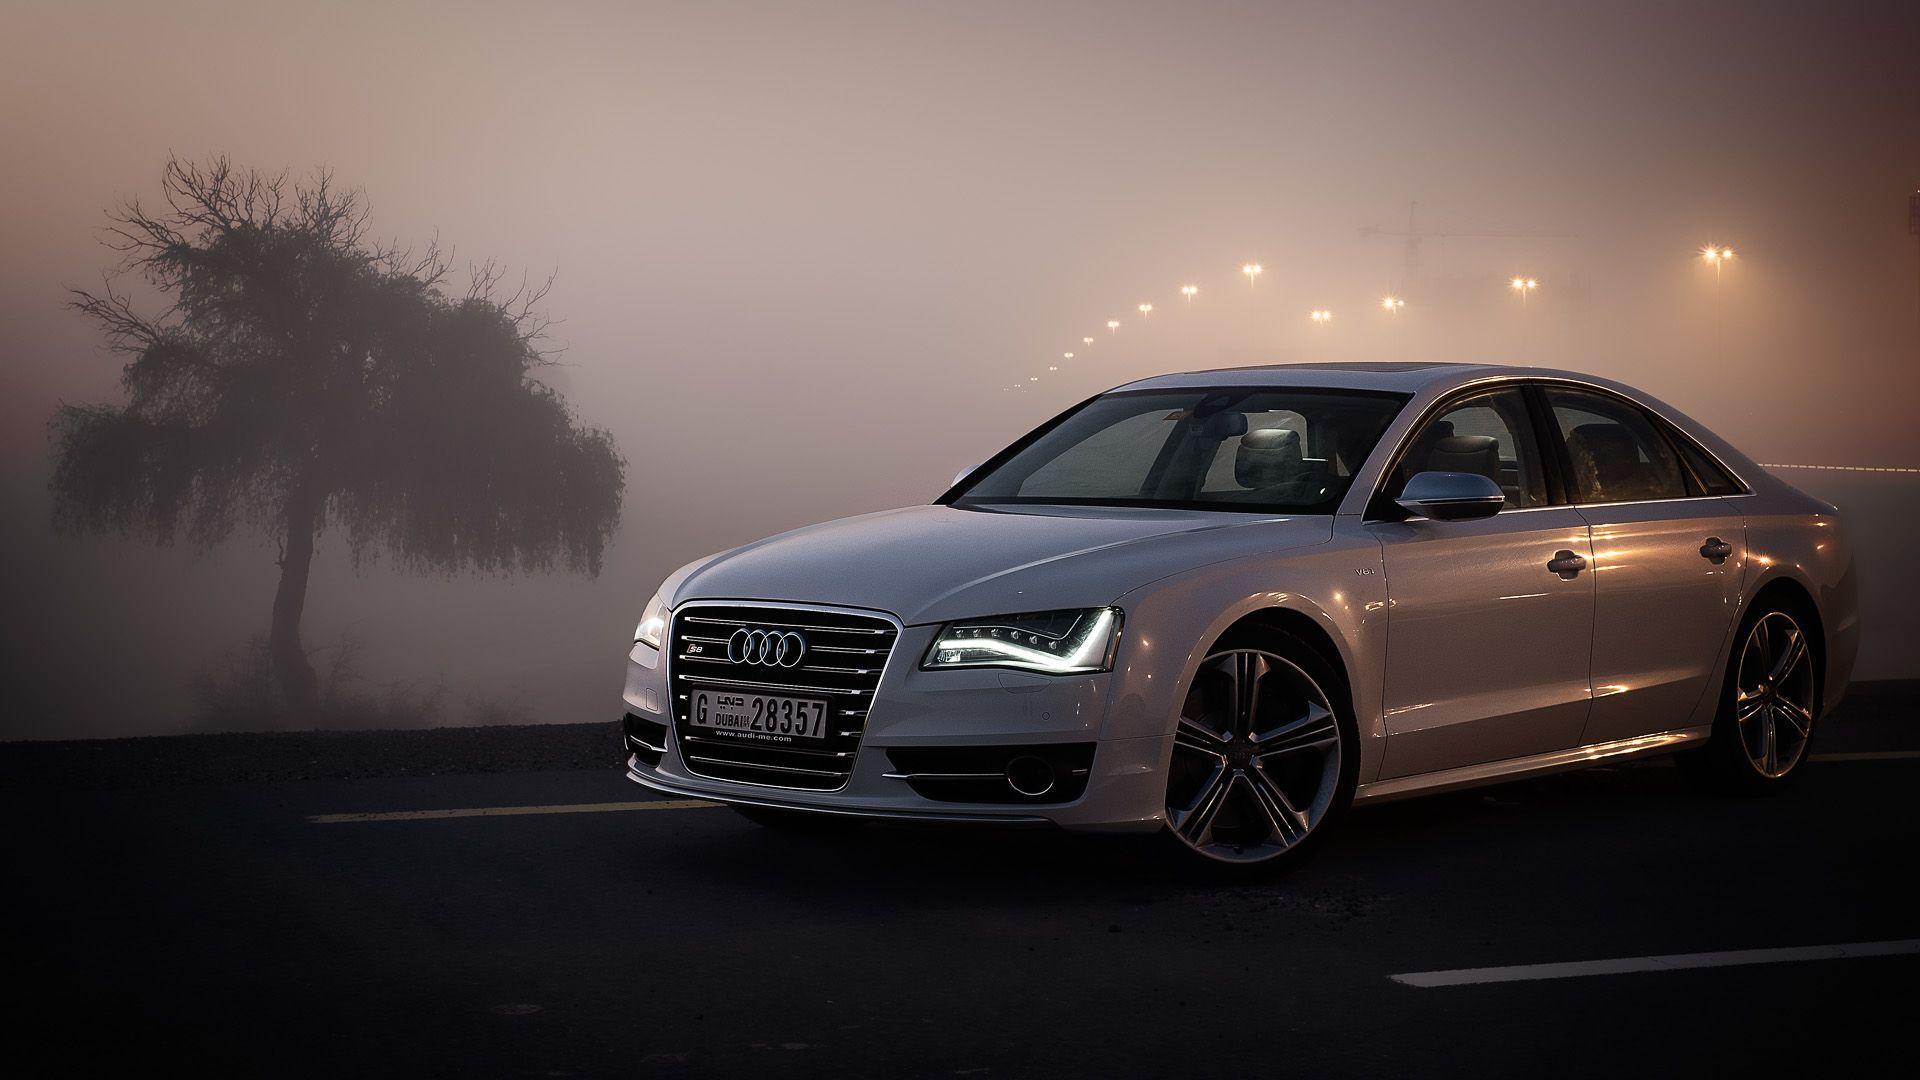 Audi S8 Wallpapers Wallpaper Cave